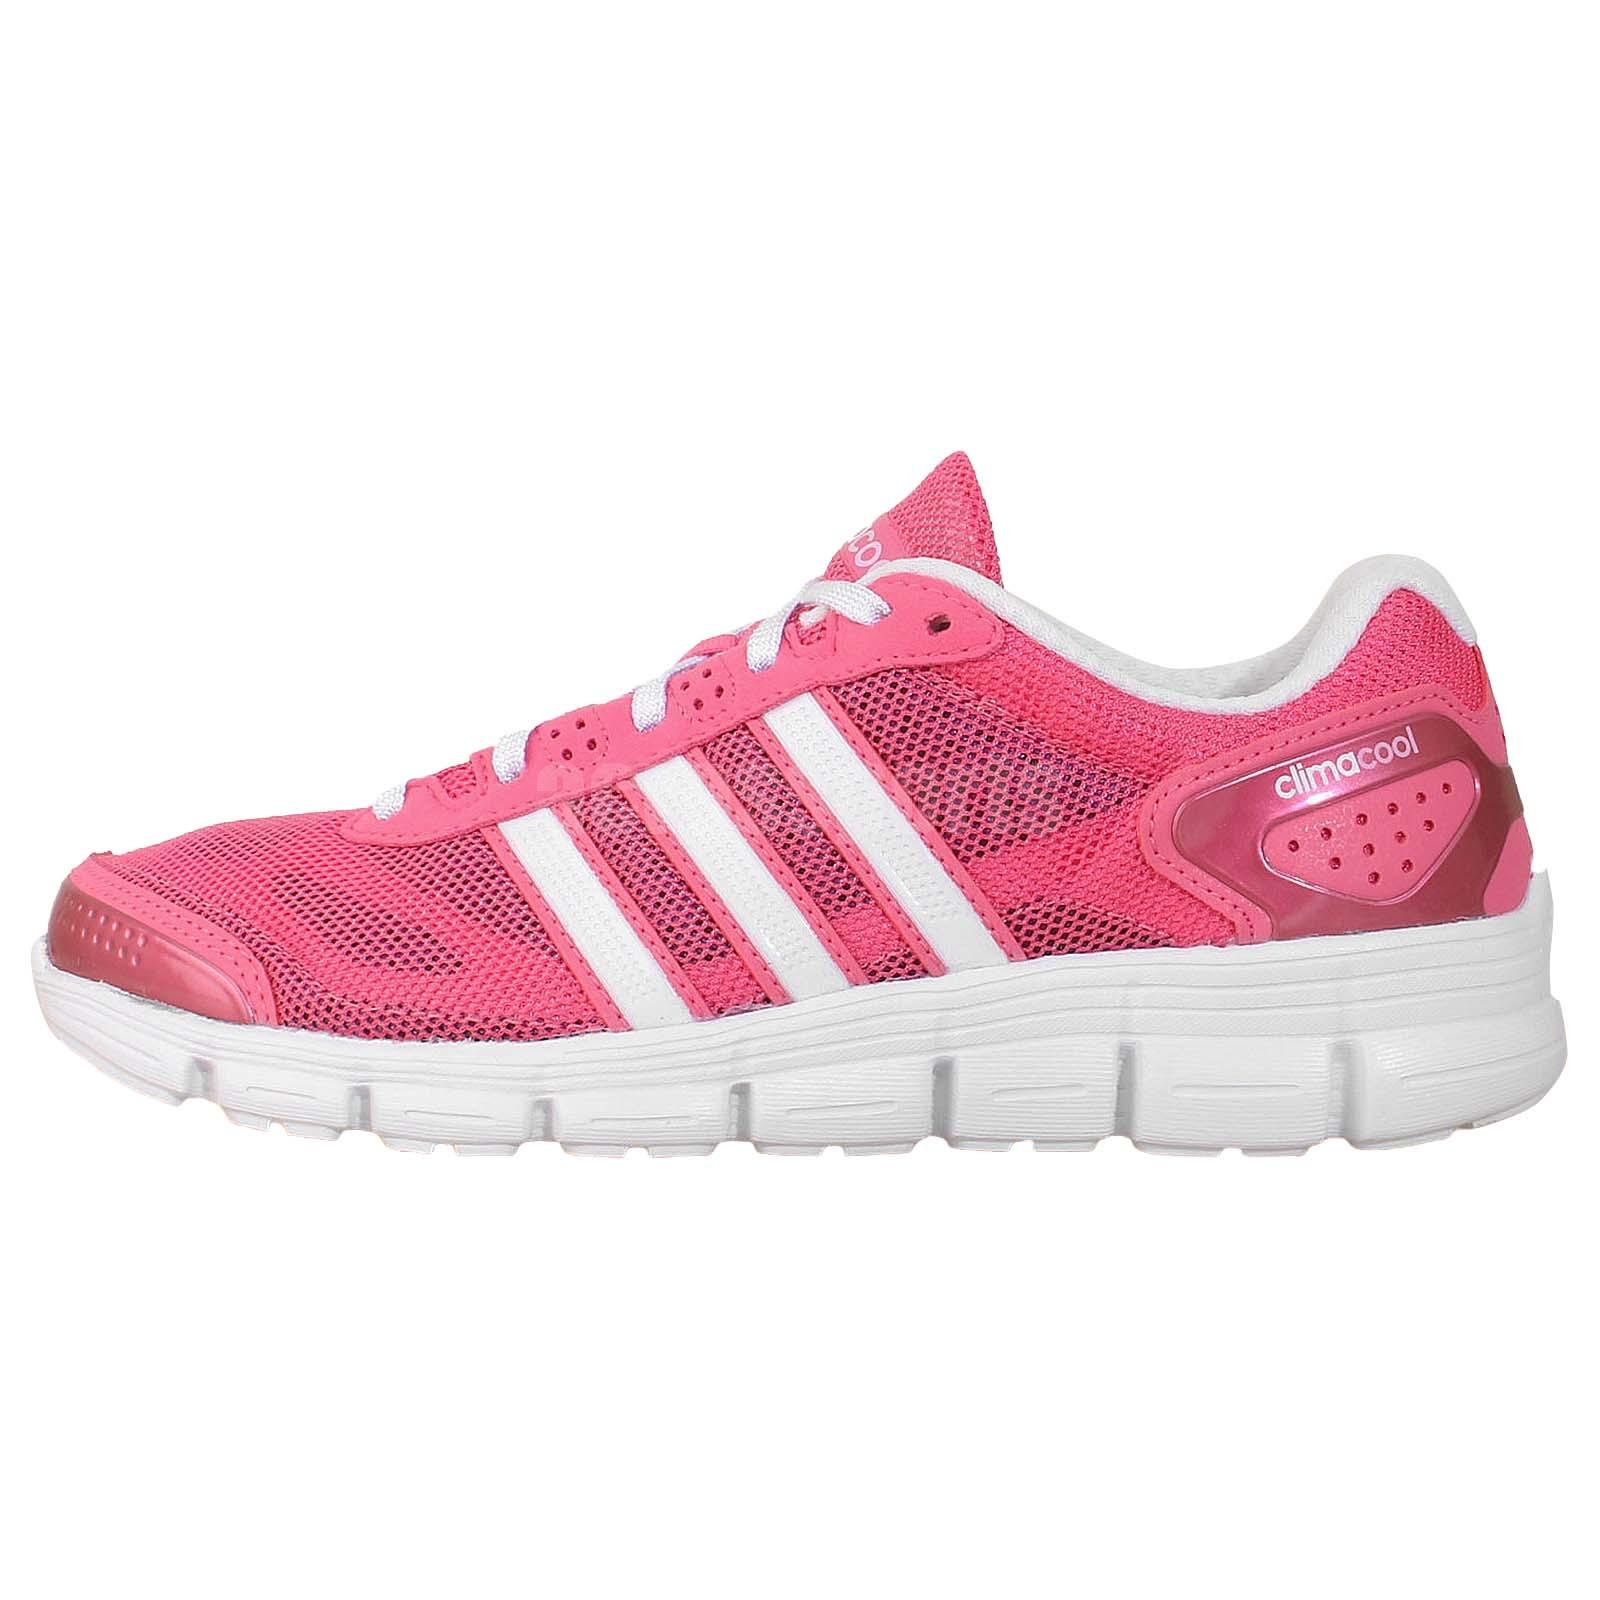 adidas cc fresh w climacool pink white 2014 womens jogging